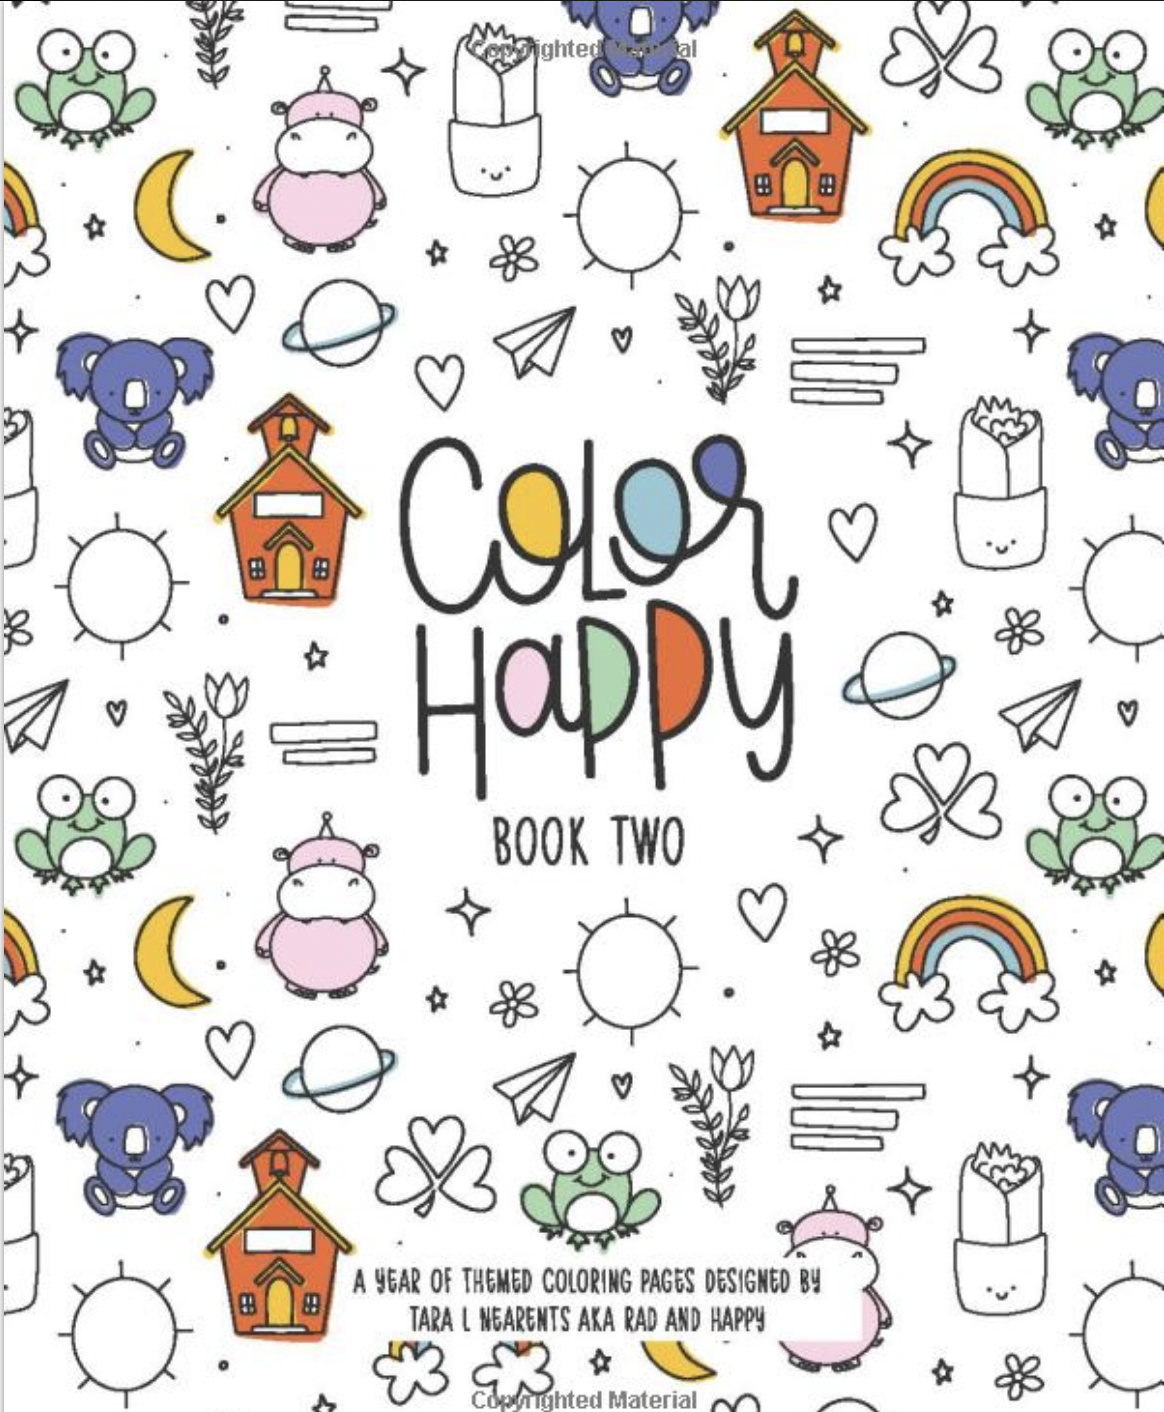 Color Happy coloring book by Tara L.  Nearants